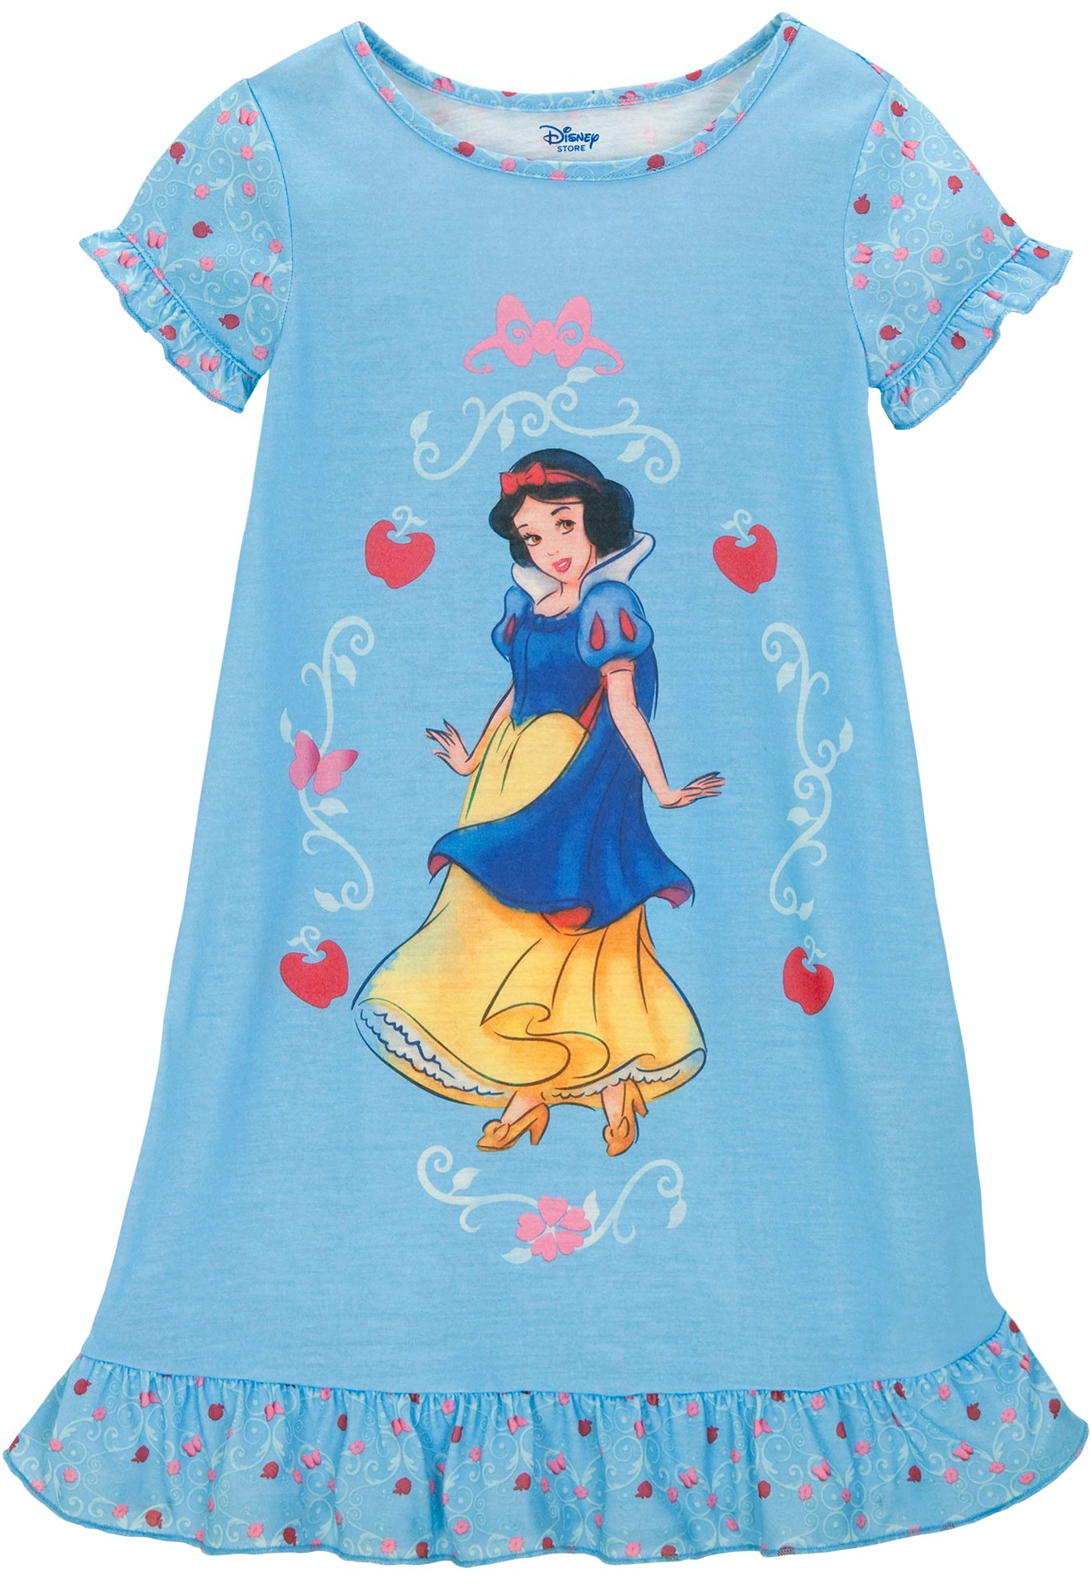 Filmic Light Snow White Archive Snow White Tees Tops